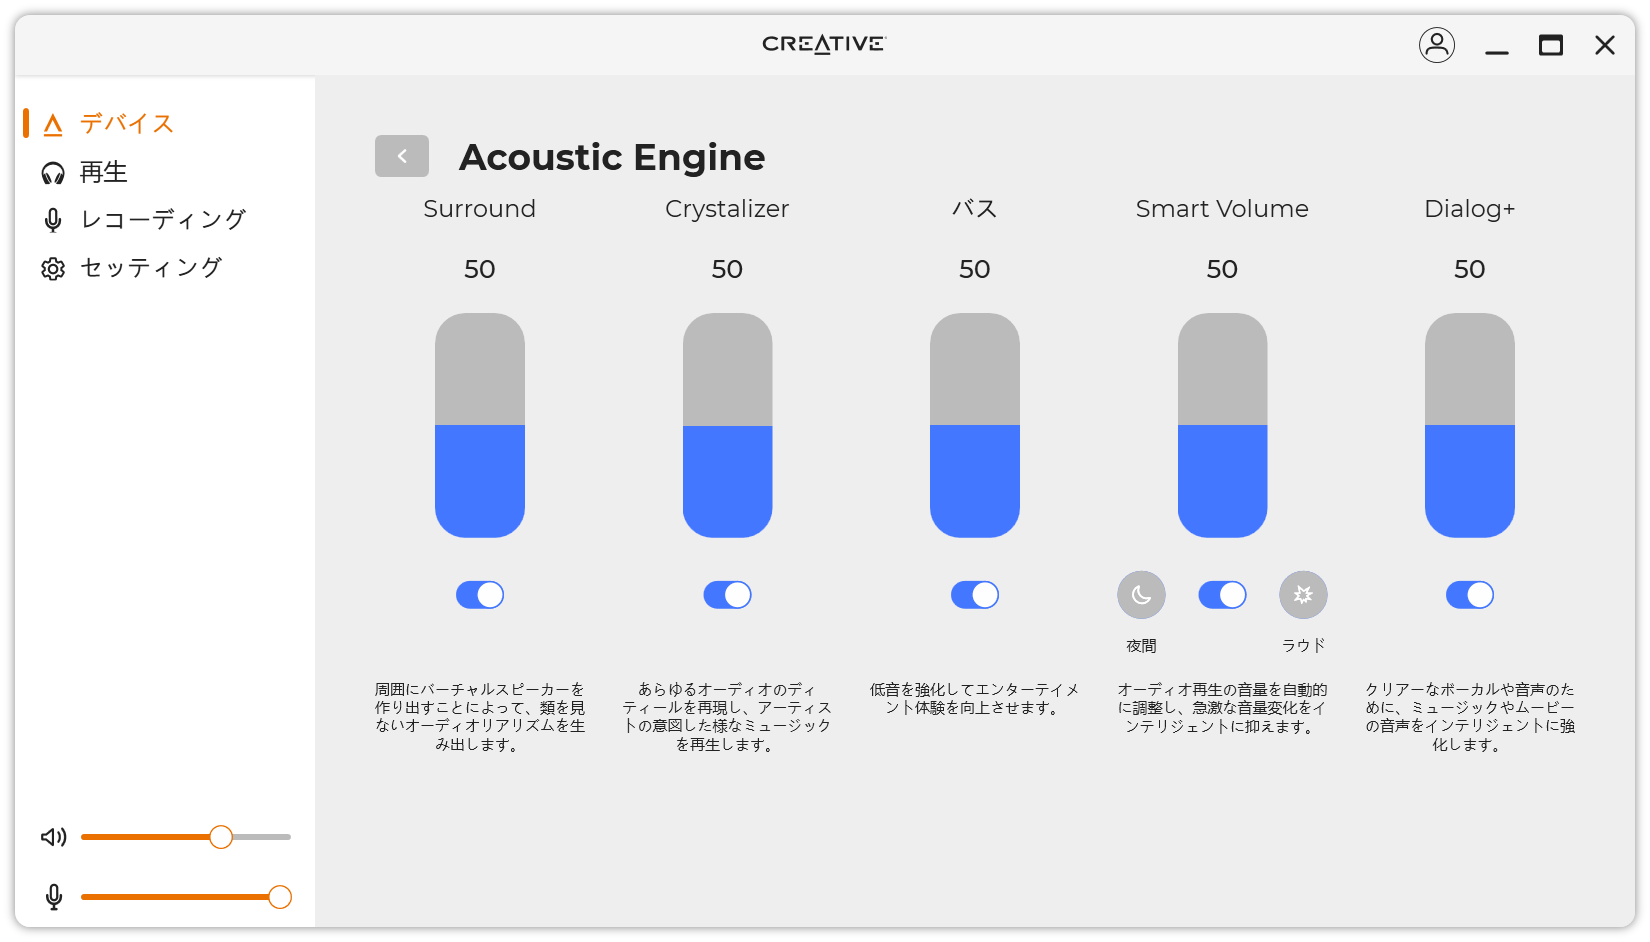 Acoustic Engine